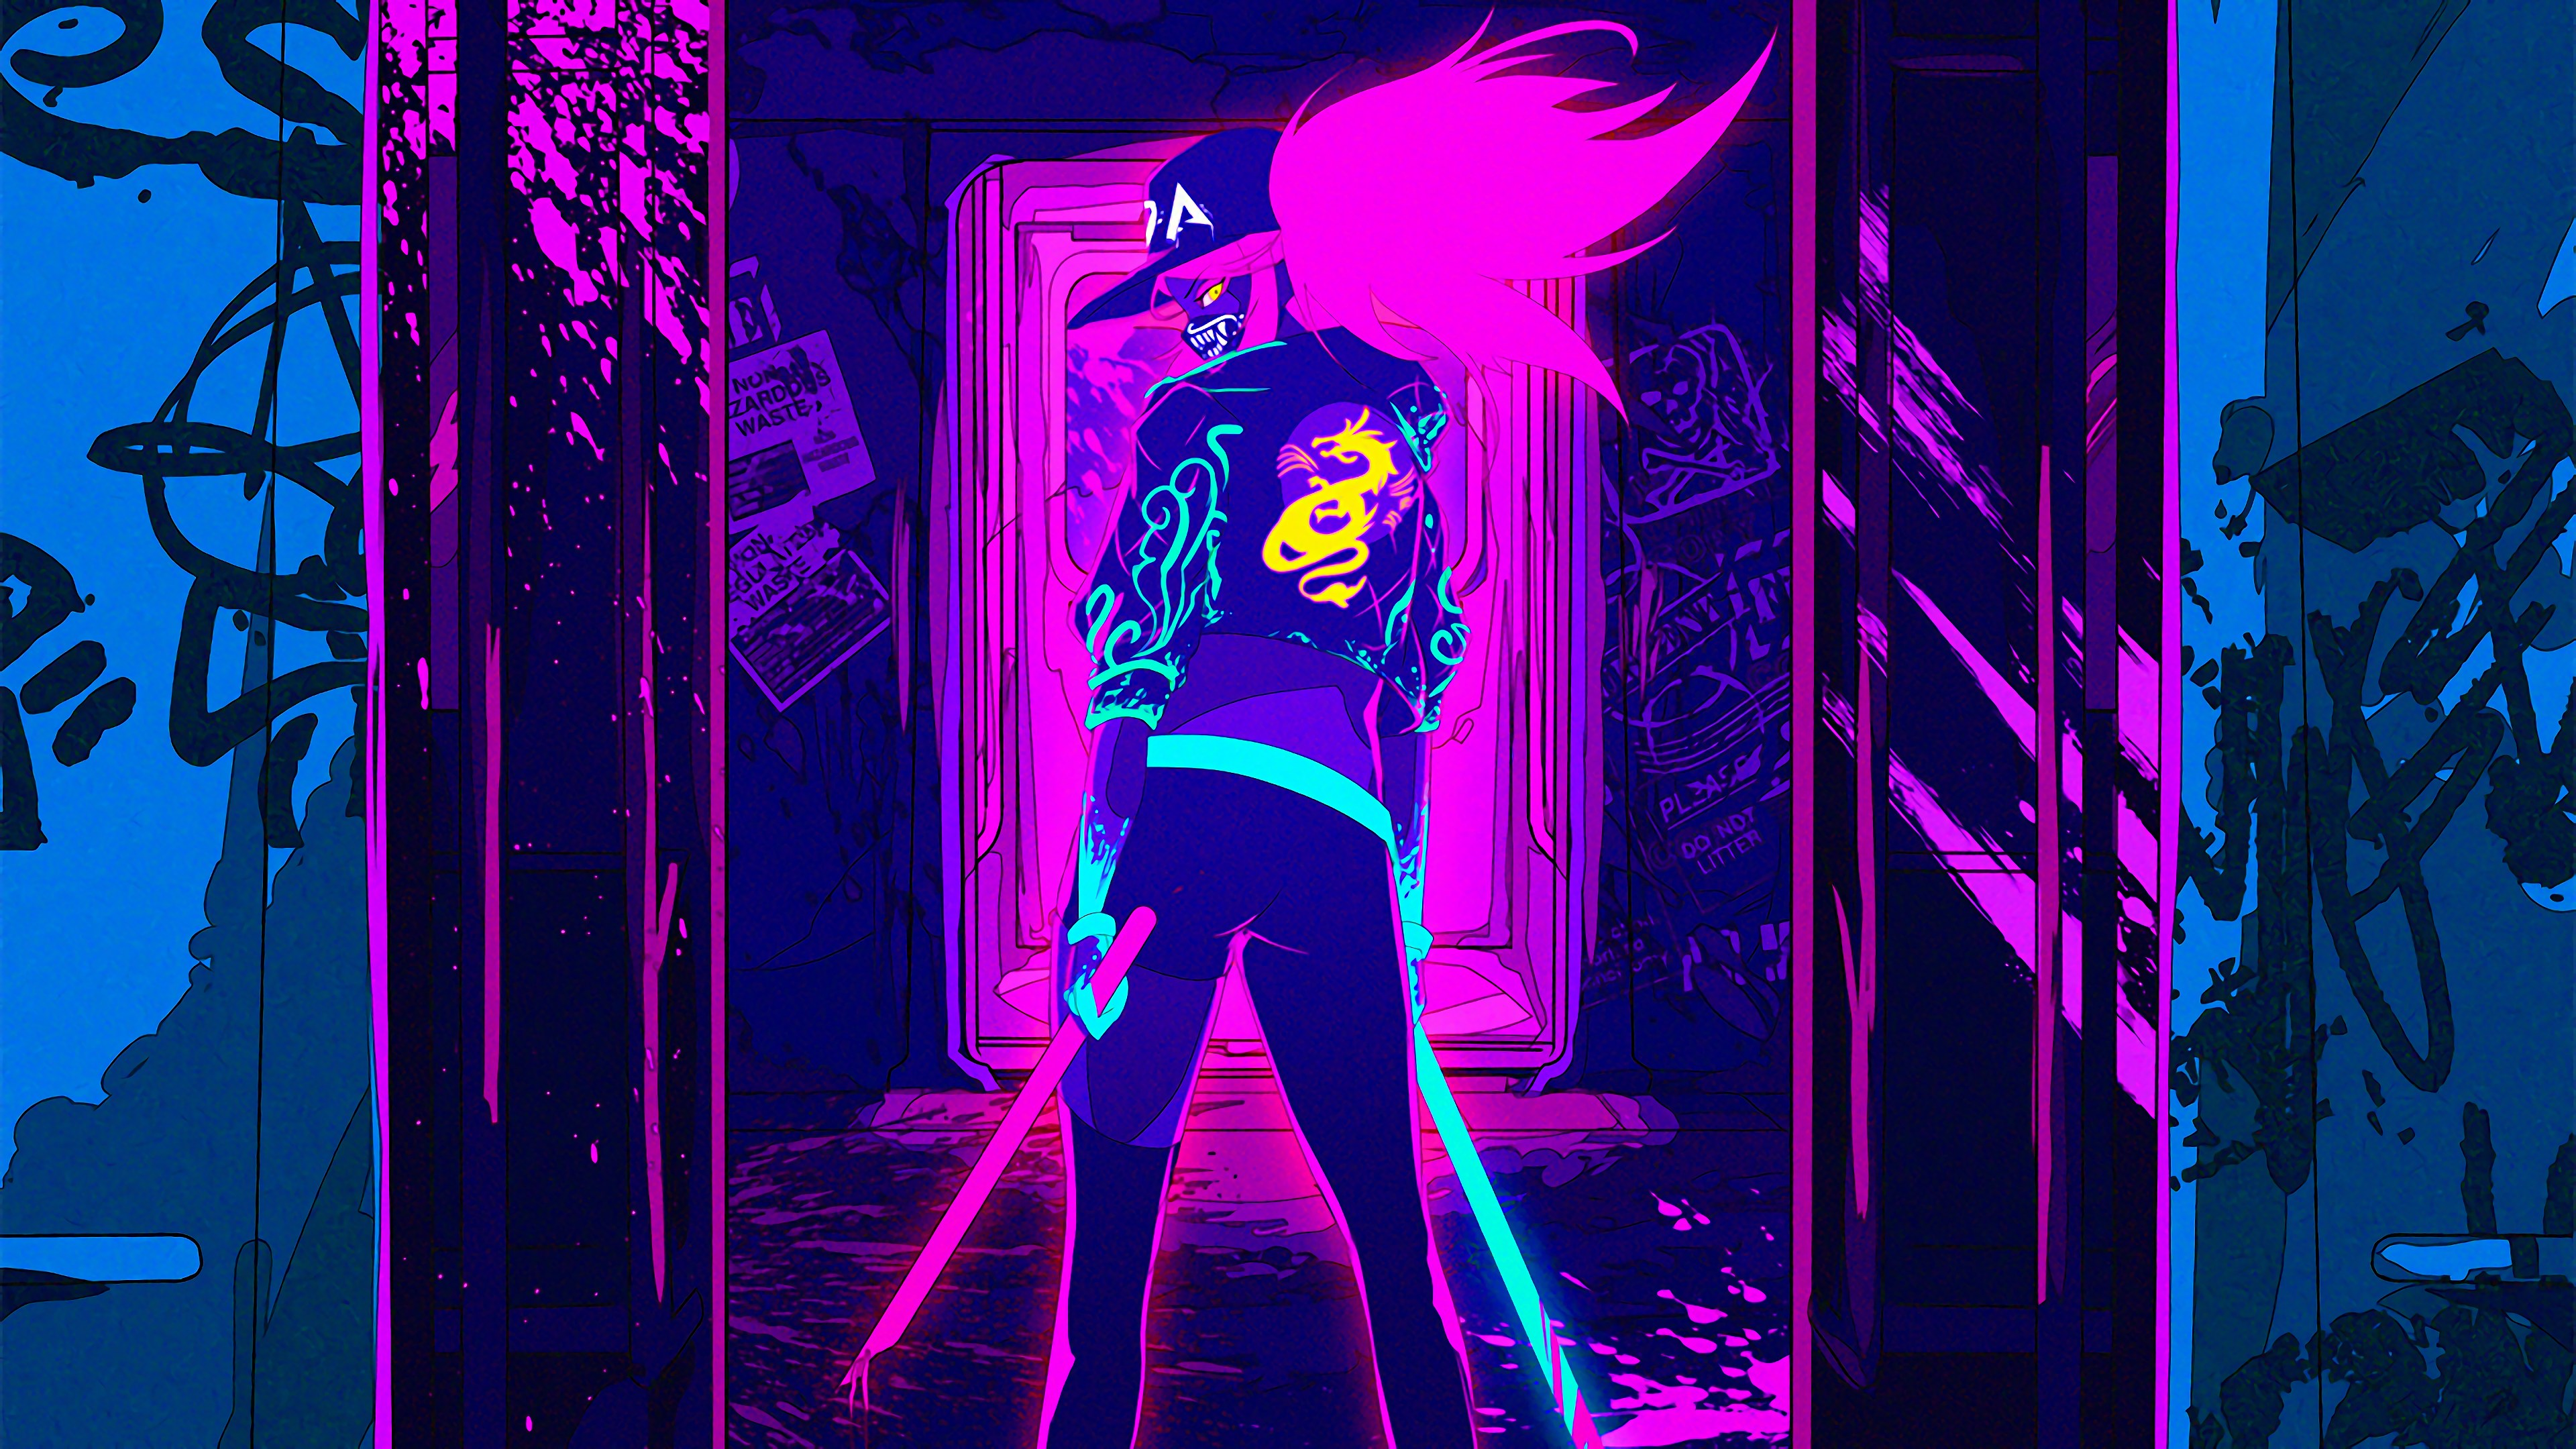 Neon Wallpaper 4k 3840x2160 Wallpaper Teahub Io